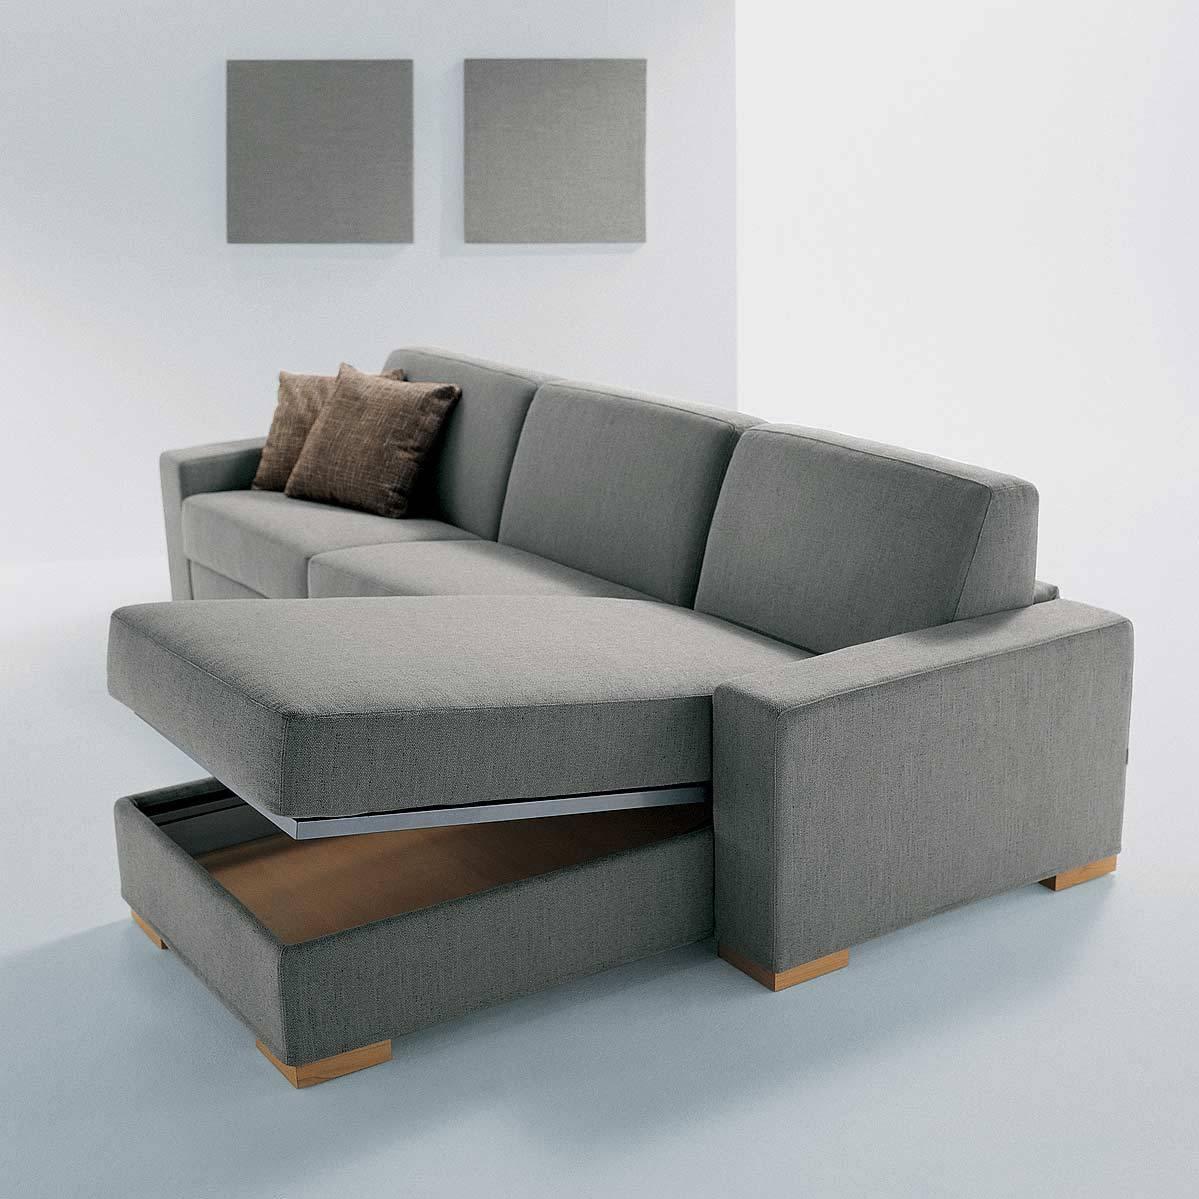 2016 Modern Minimalist Fabric Sofa Bed / King Size Sofa Beds throughout King Size Sofa Beds (Image 1 of 15)